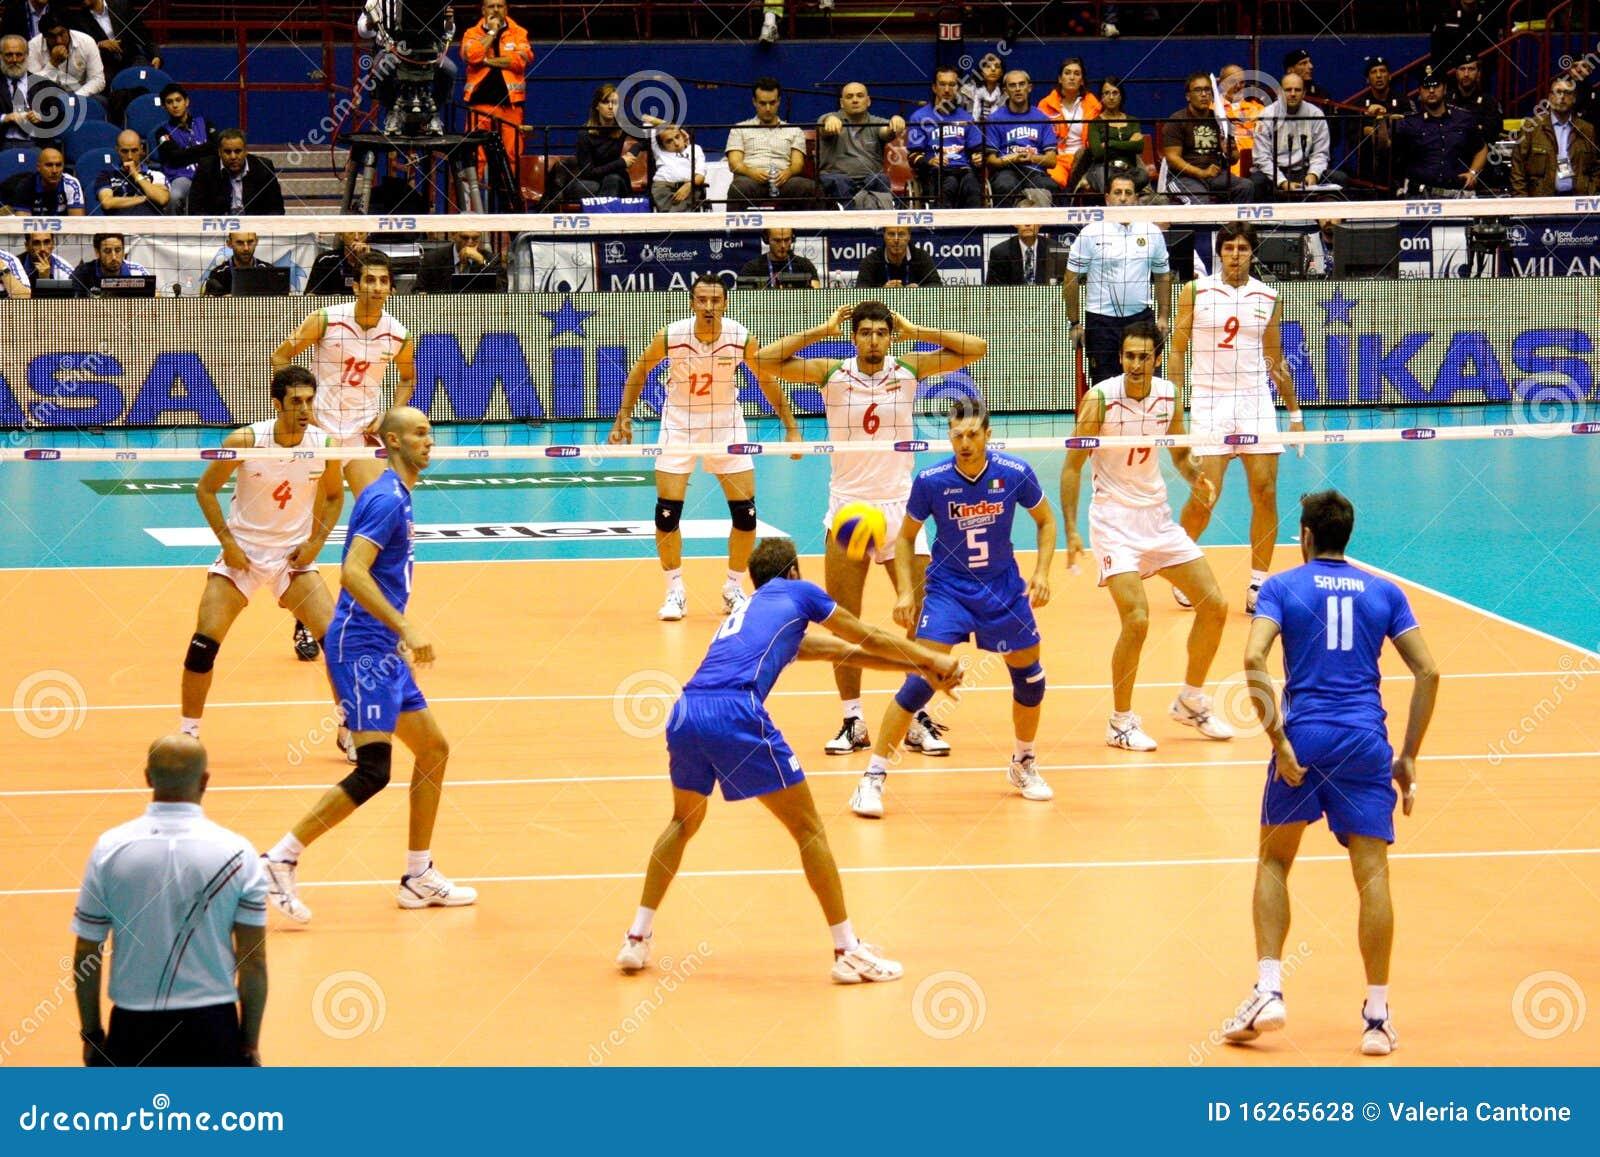 volleyball world championship